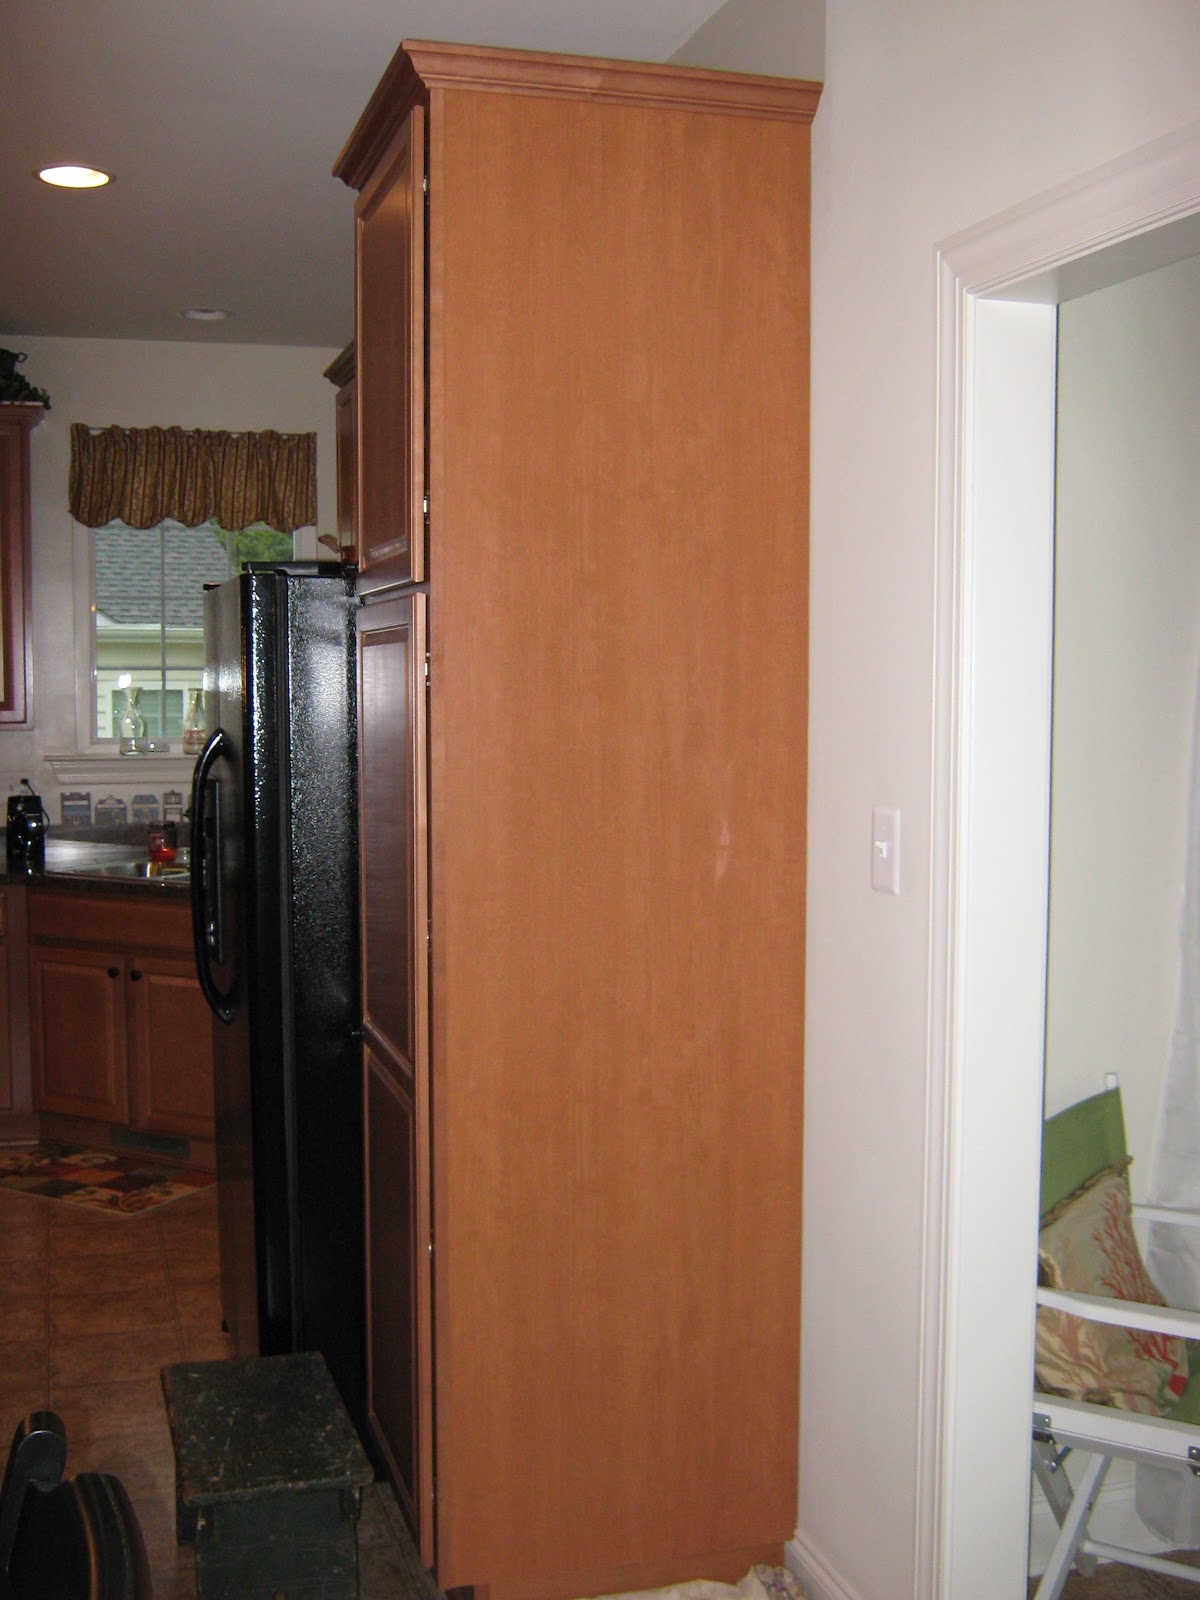 Menu Board Kitchen Cabinet